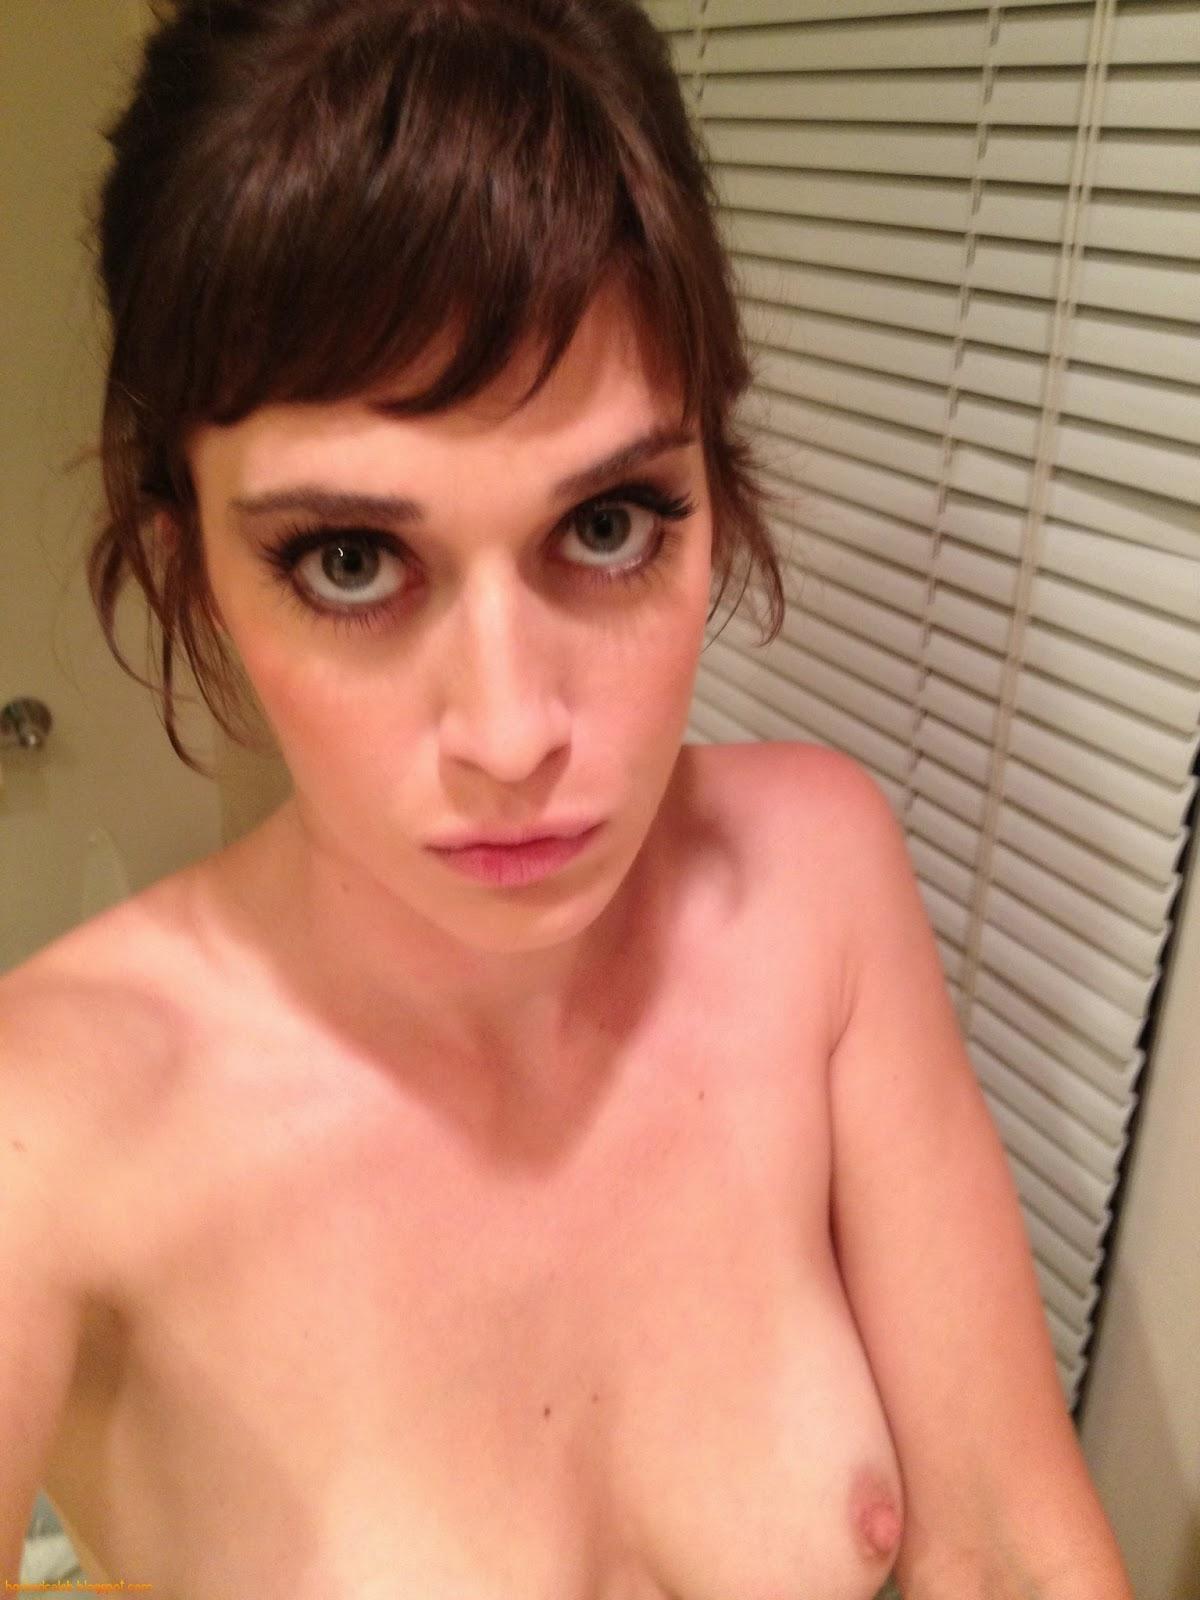 lizzy-caplan-nude-leaked-icloud-hacked-celebrity-1